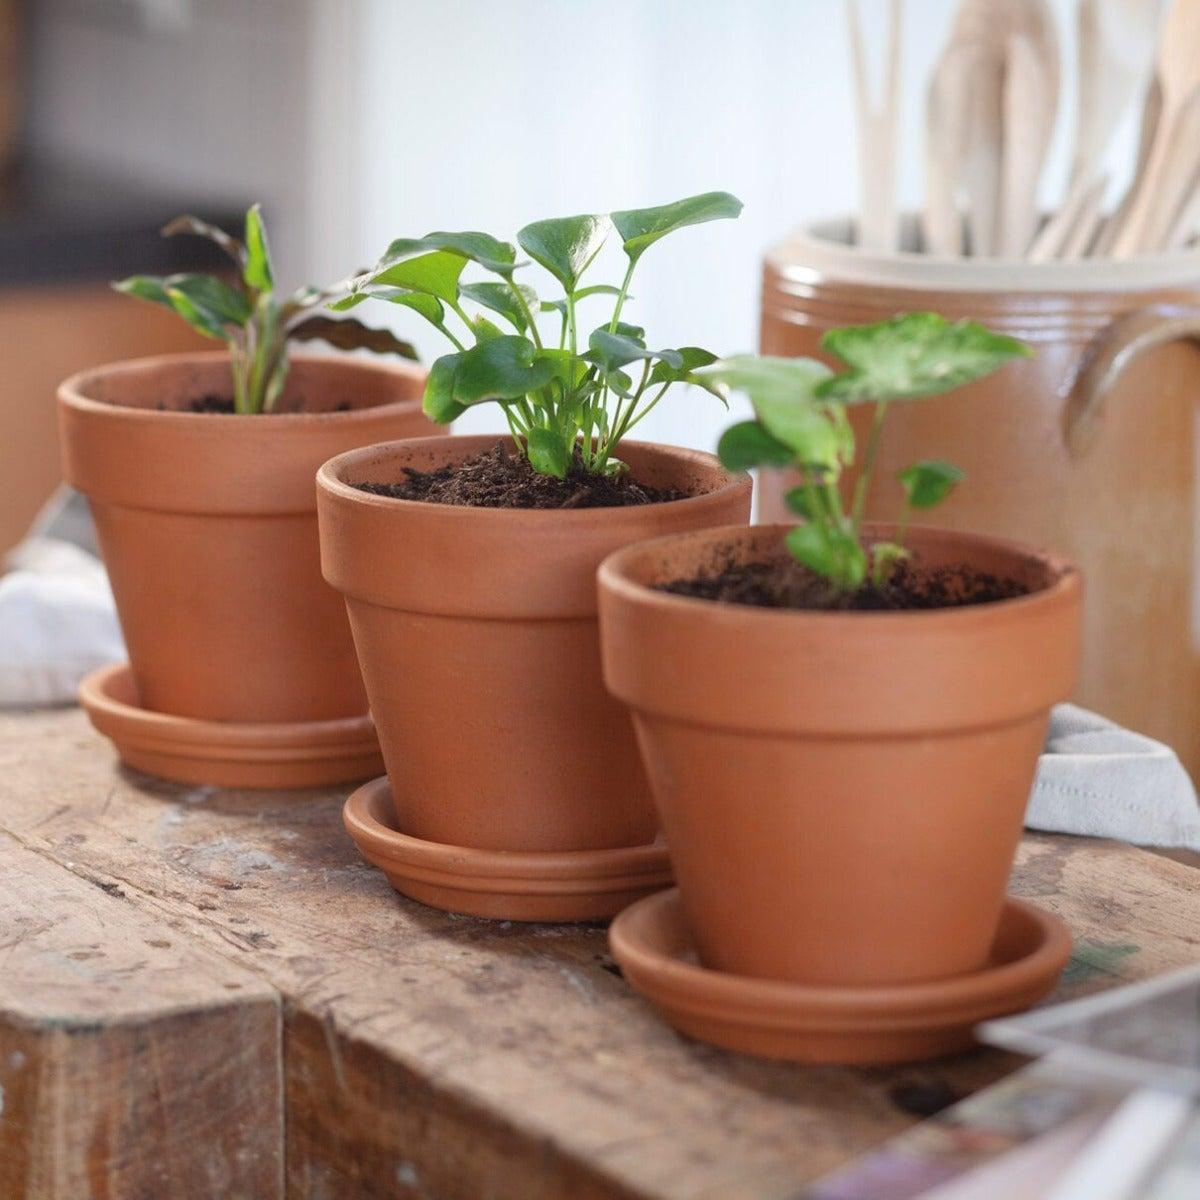 Babyplantjes in terracotta potjes